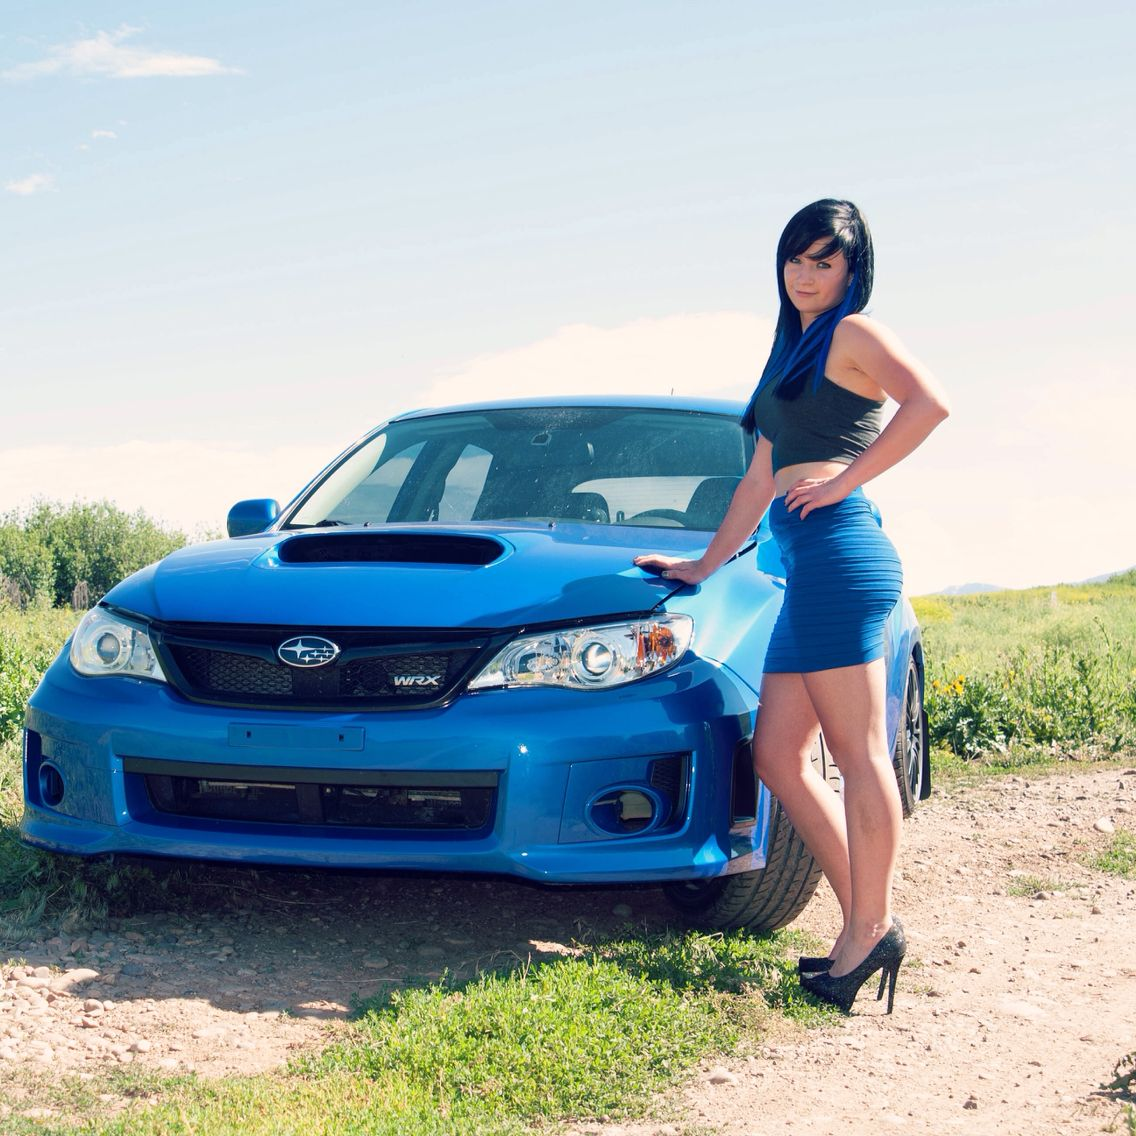 Subaru Wrx Girls And Cars Hottie Tristinworden Photography